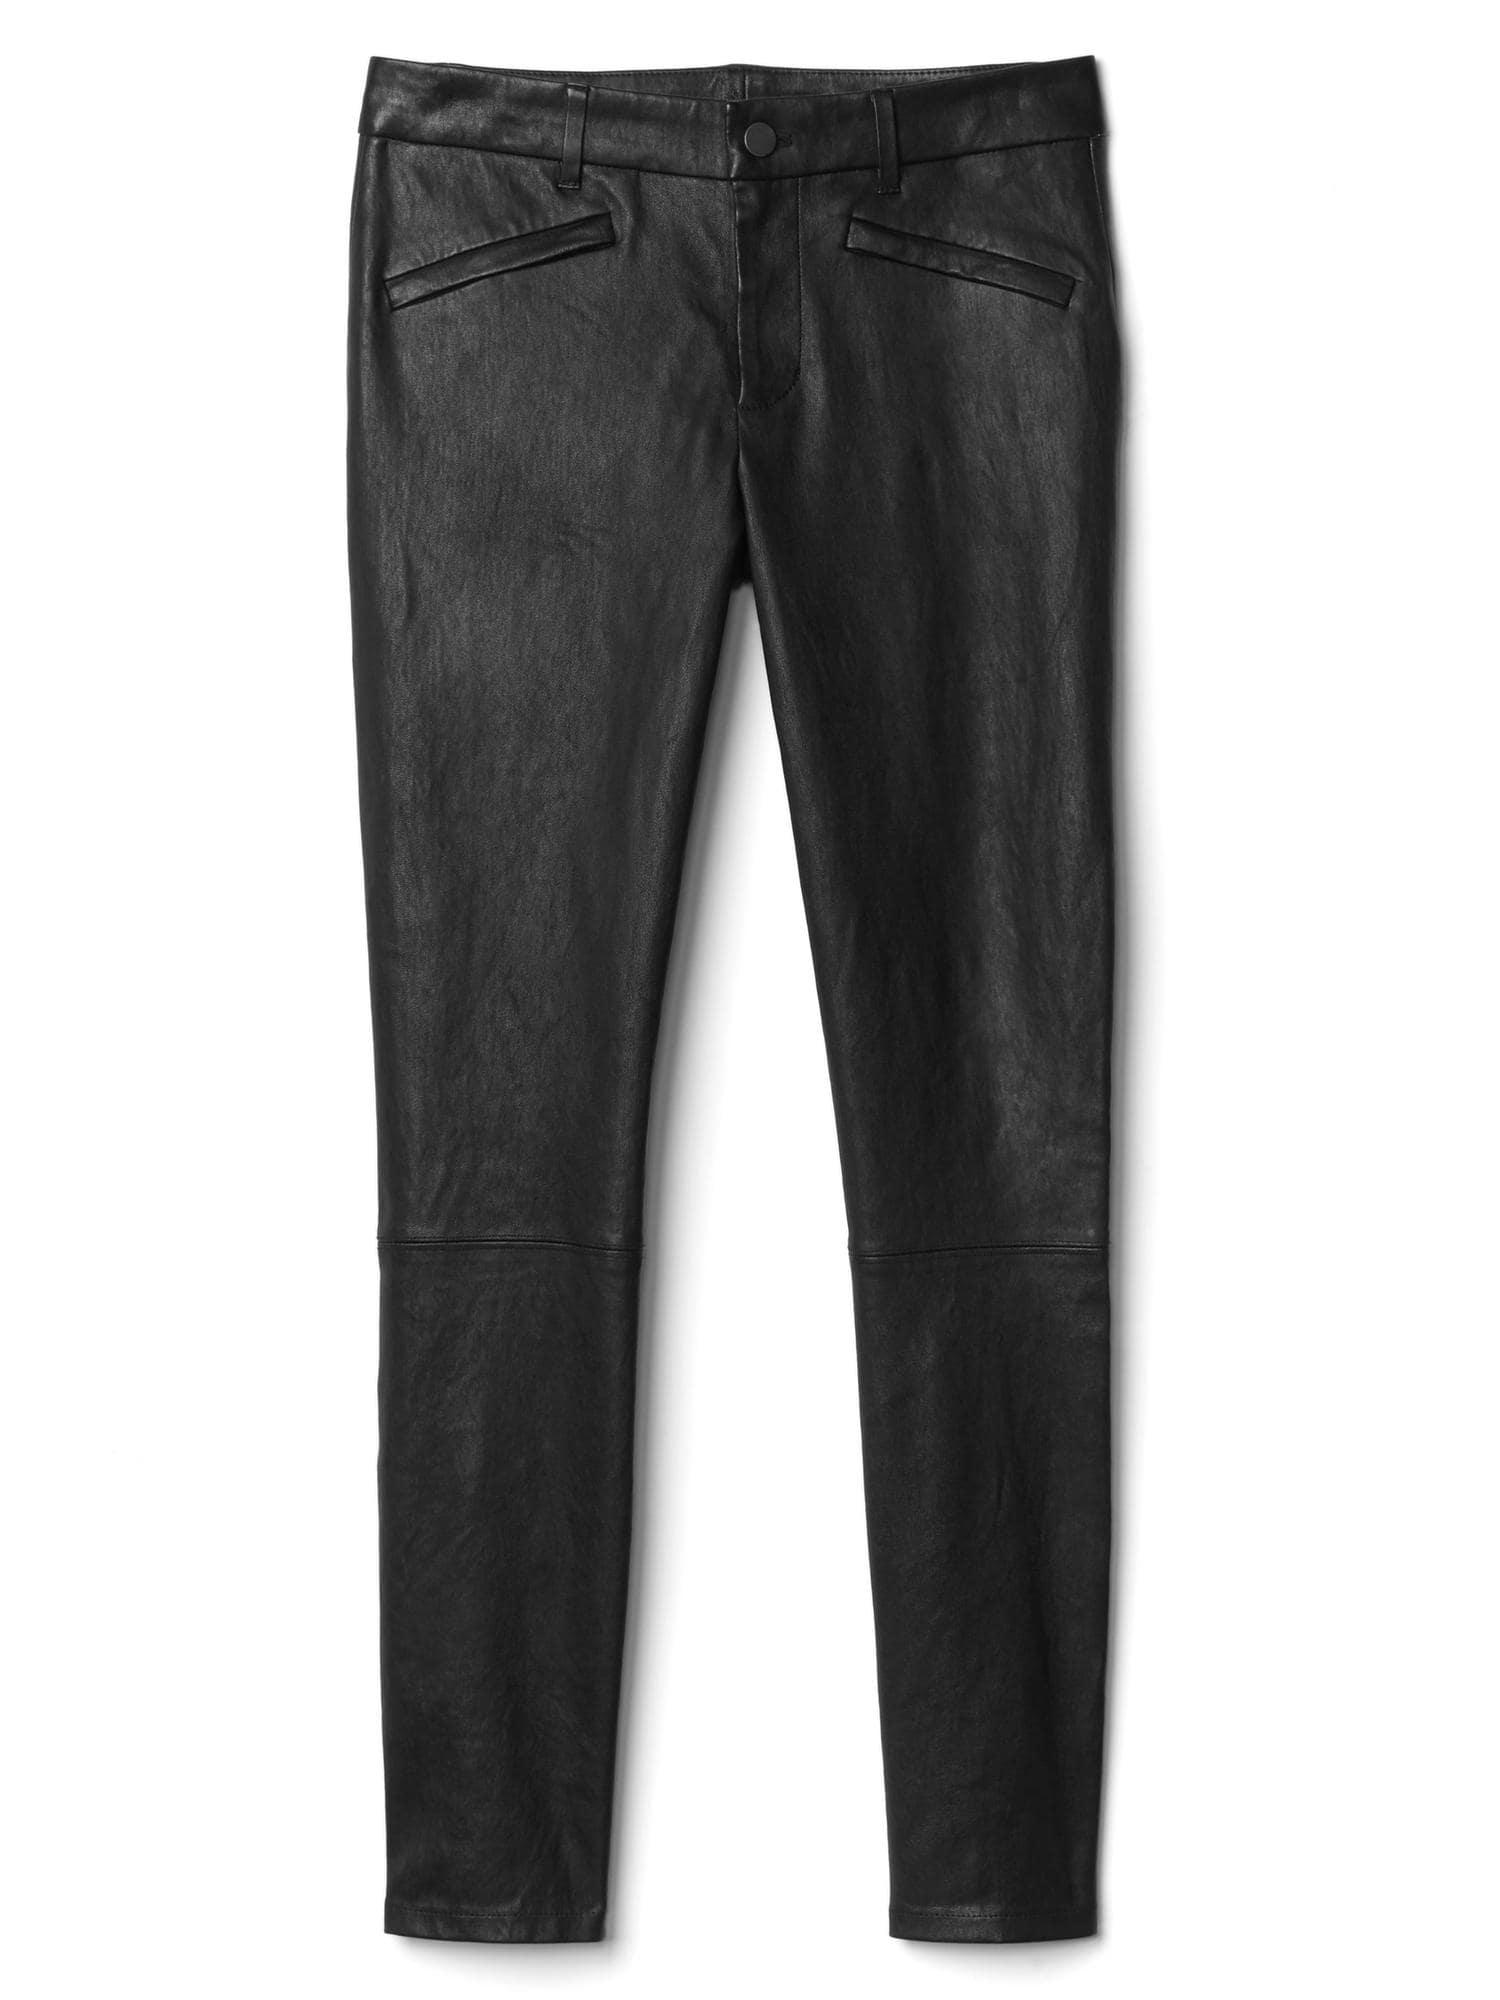 leather-pants-fall-2017.jpg